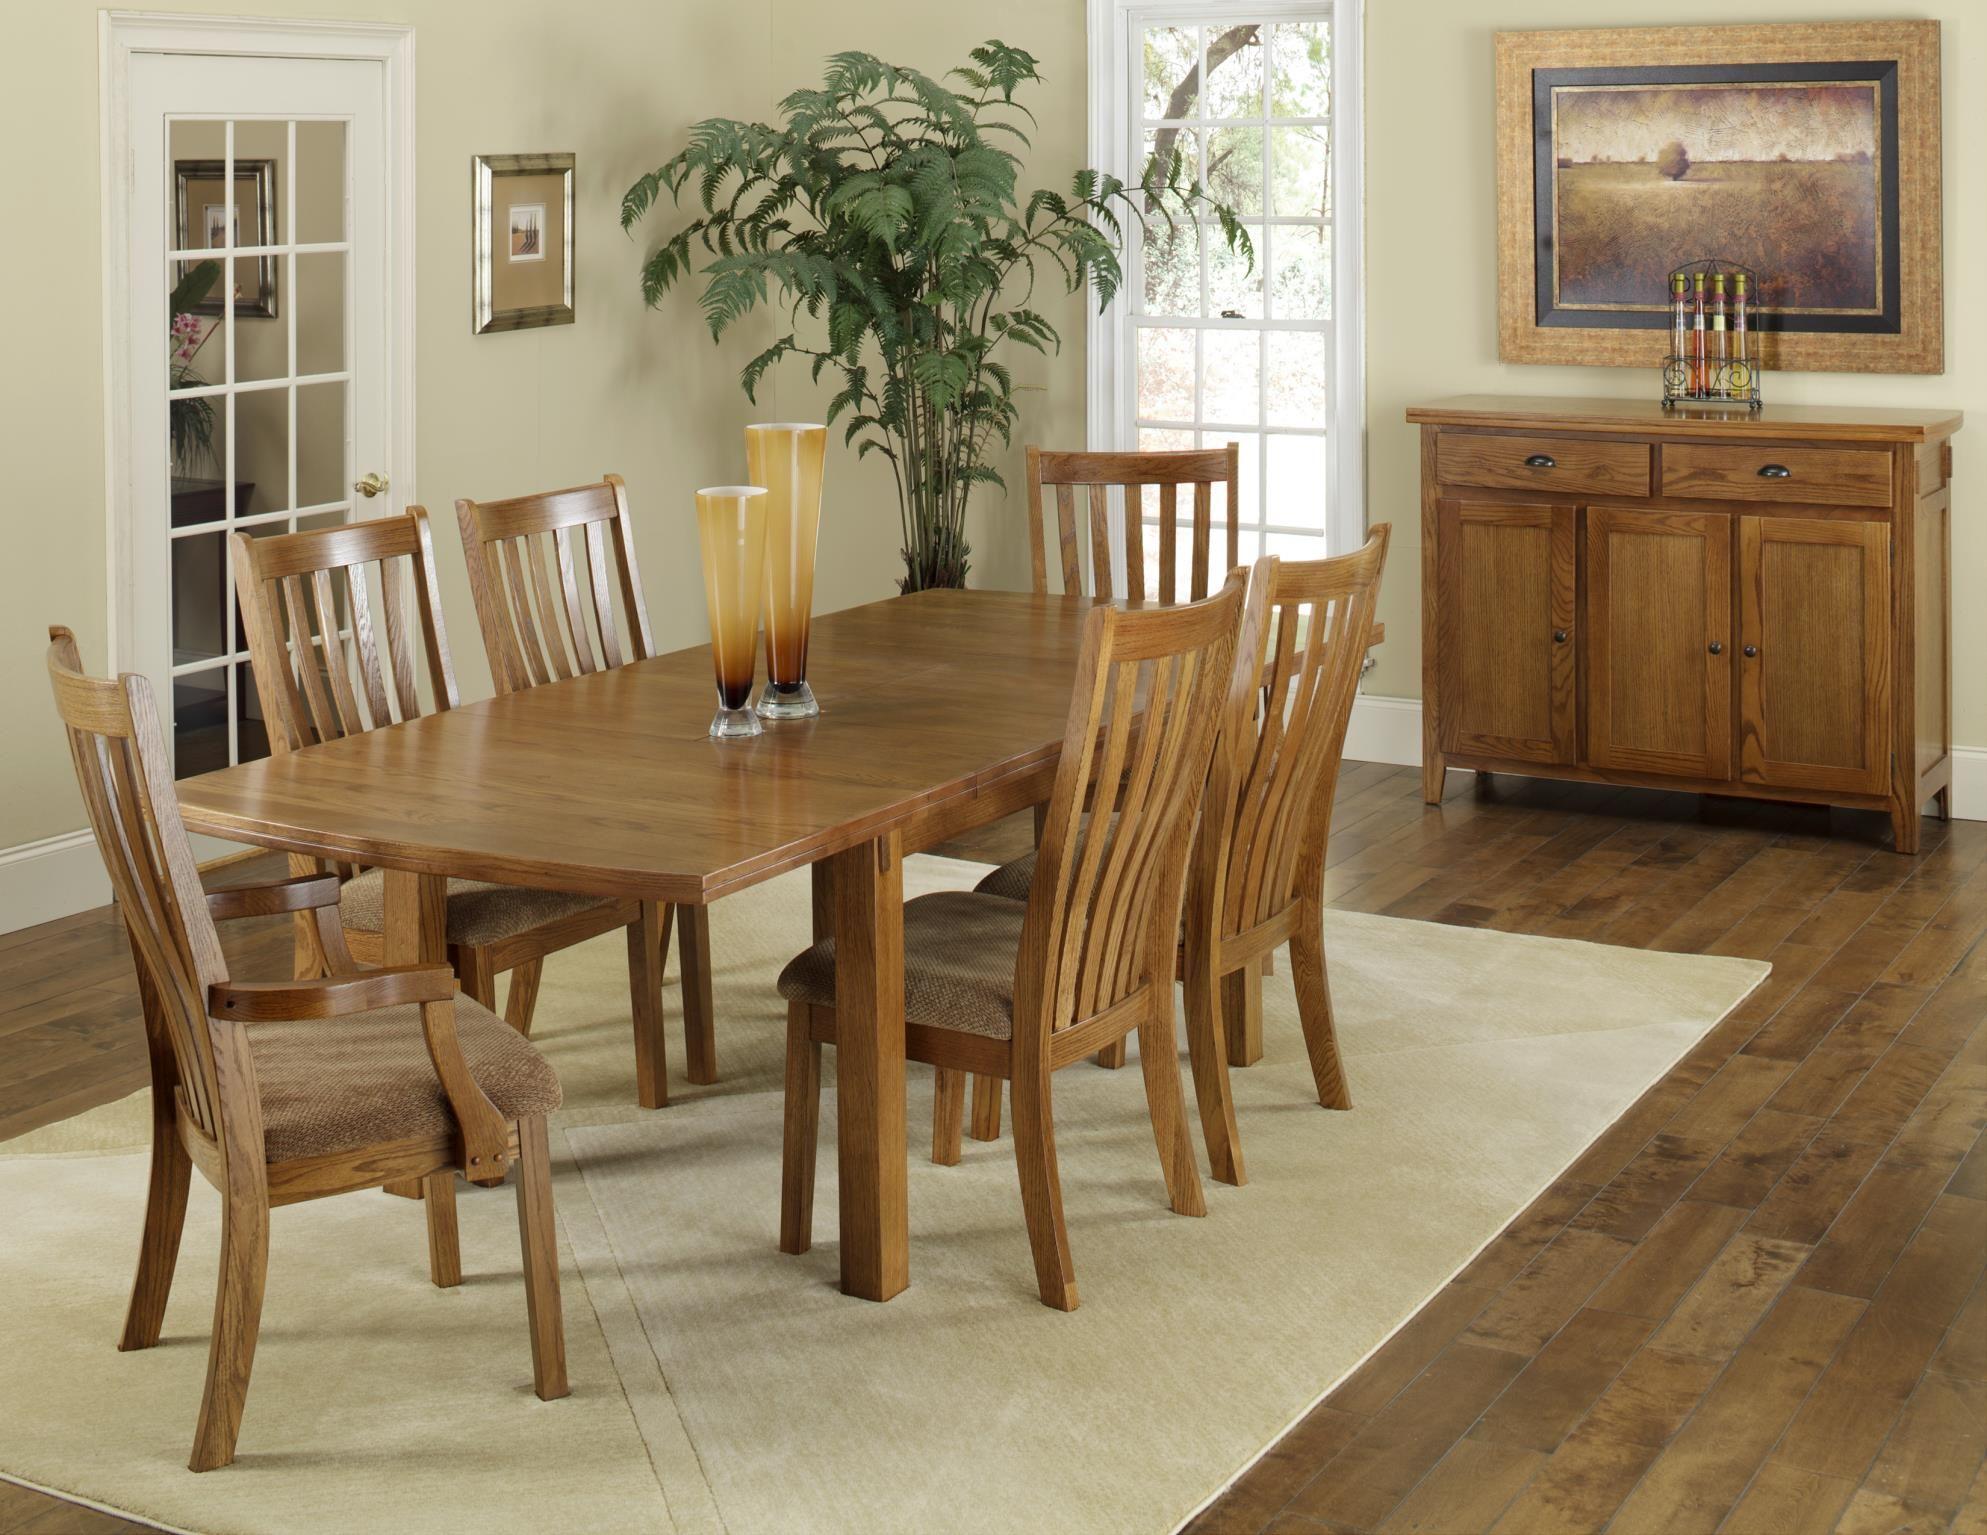 Products Tei Furniture Hardwood Furniture Home Decor